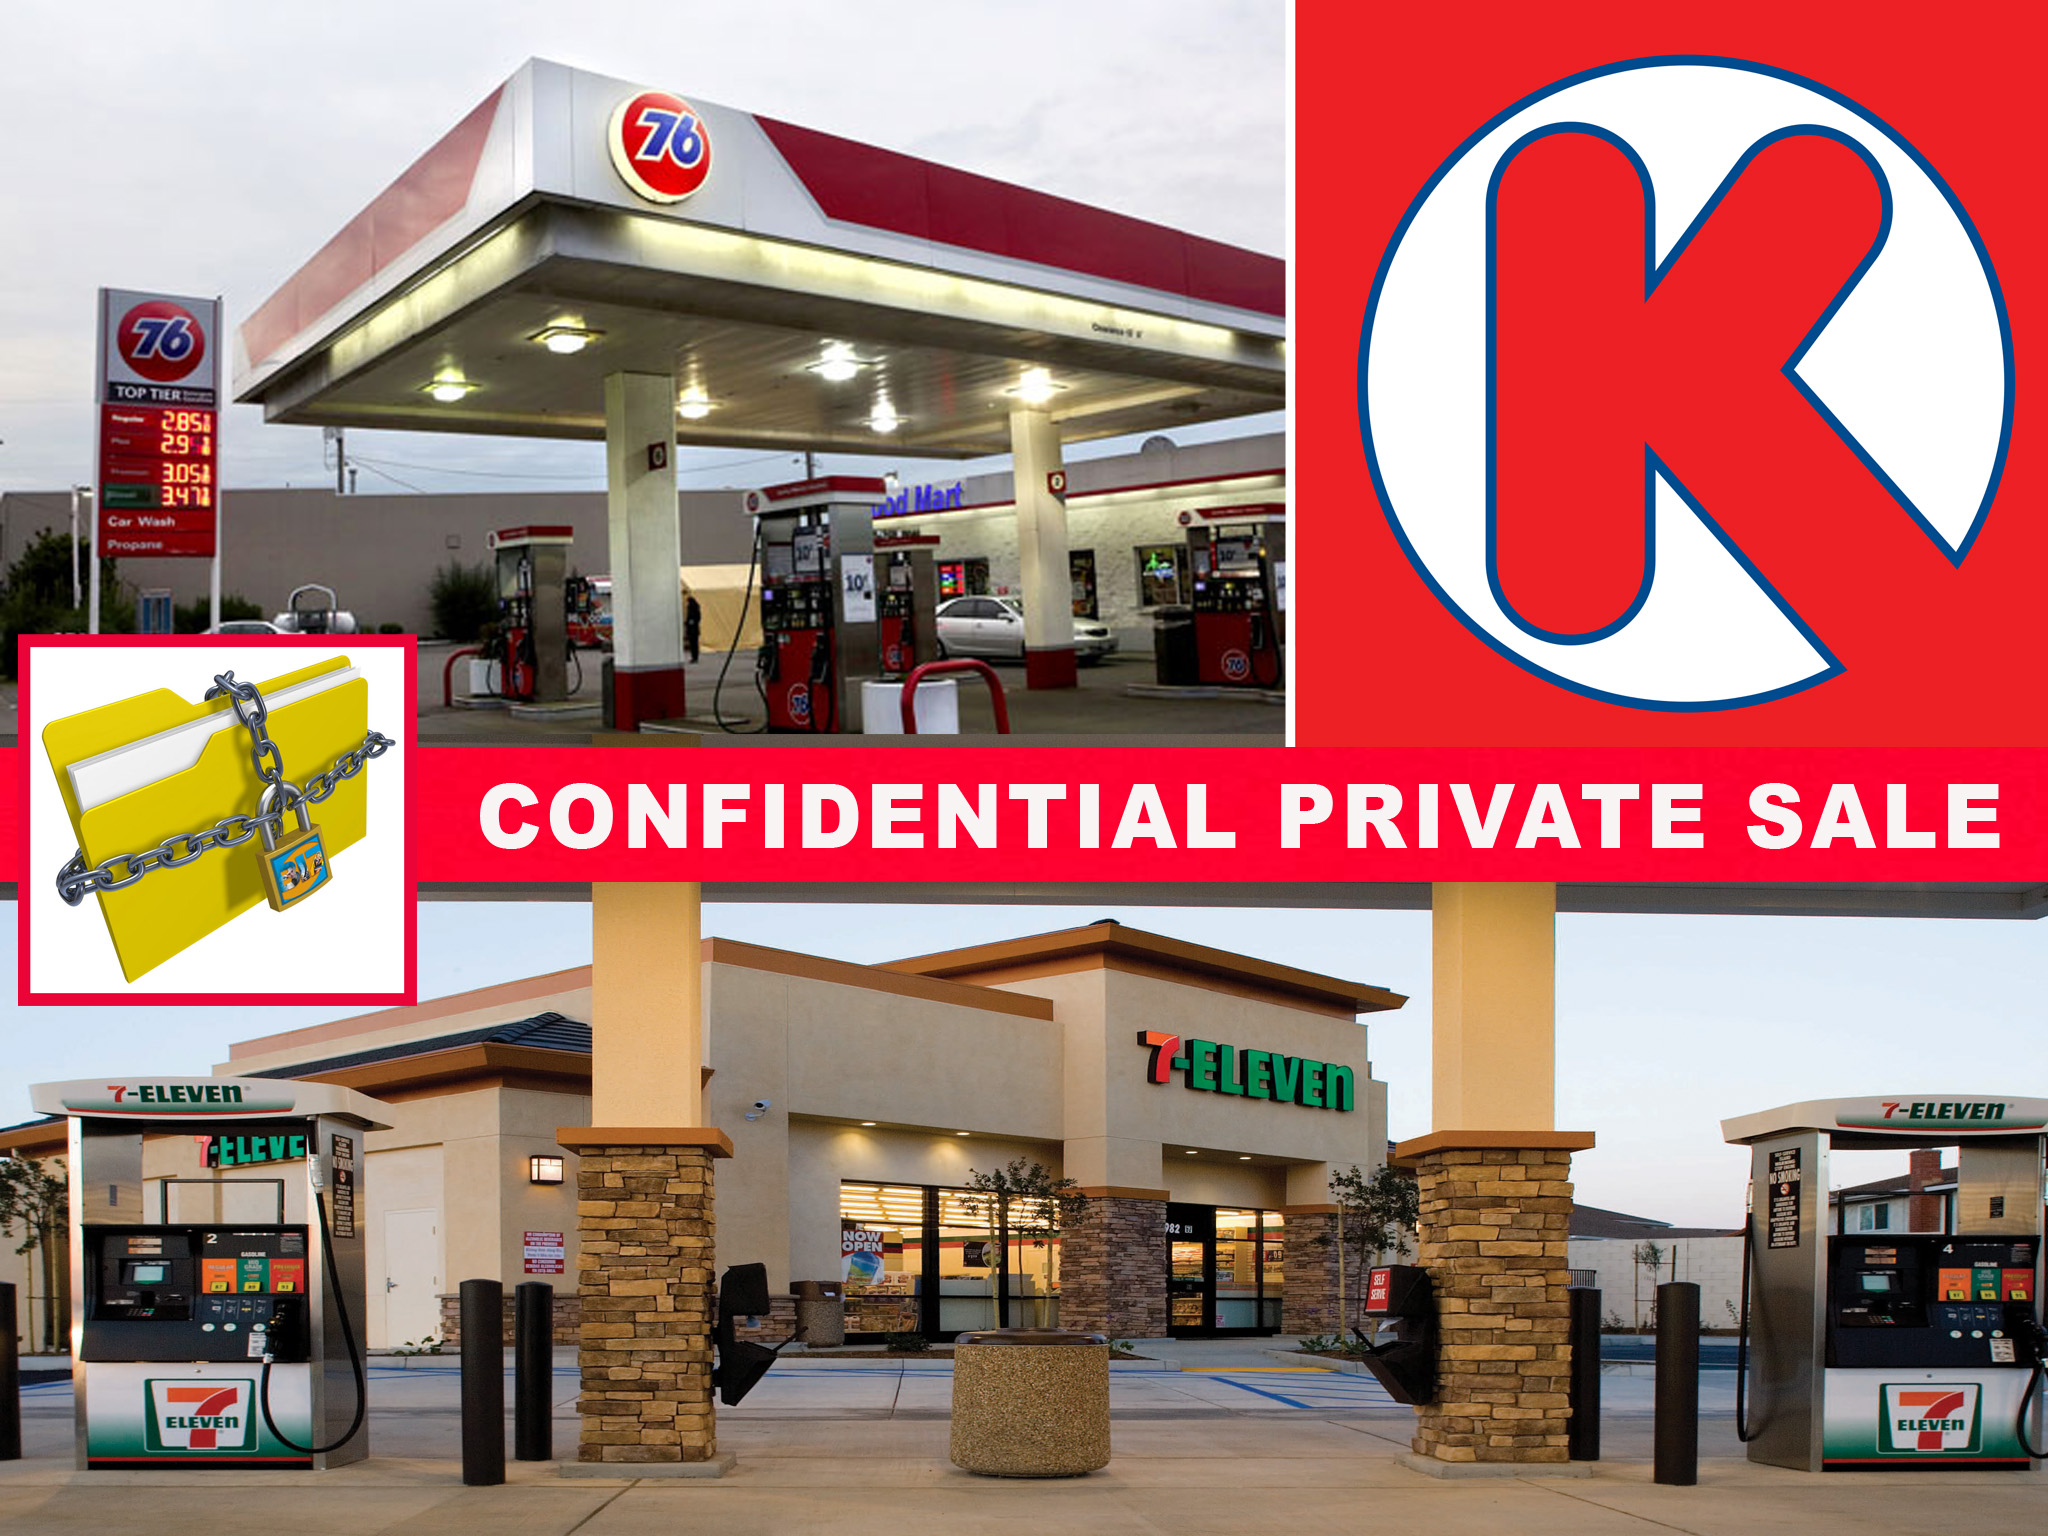 Cps Car Loan >> Coming Soon: Circle K, 7-Eleven + Car Wash! | BIZ Builder.Com